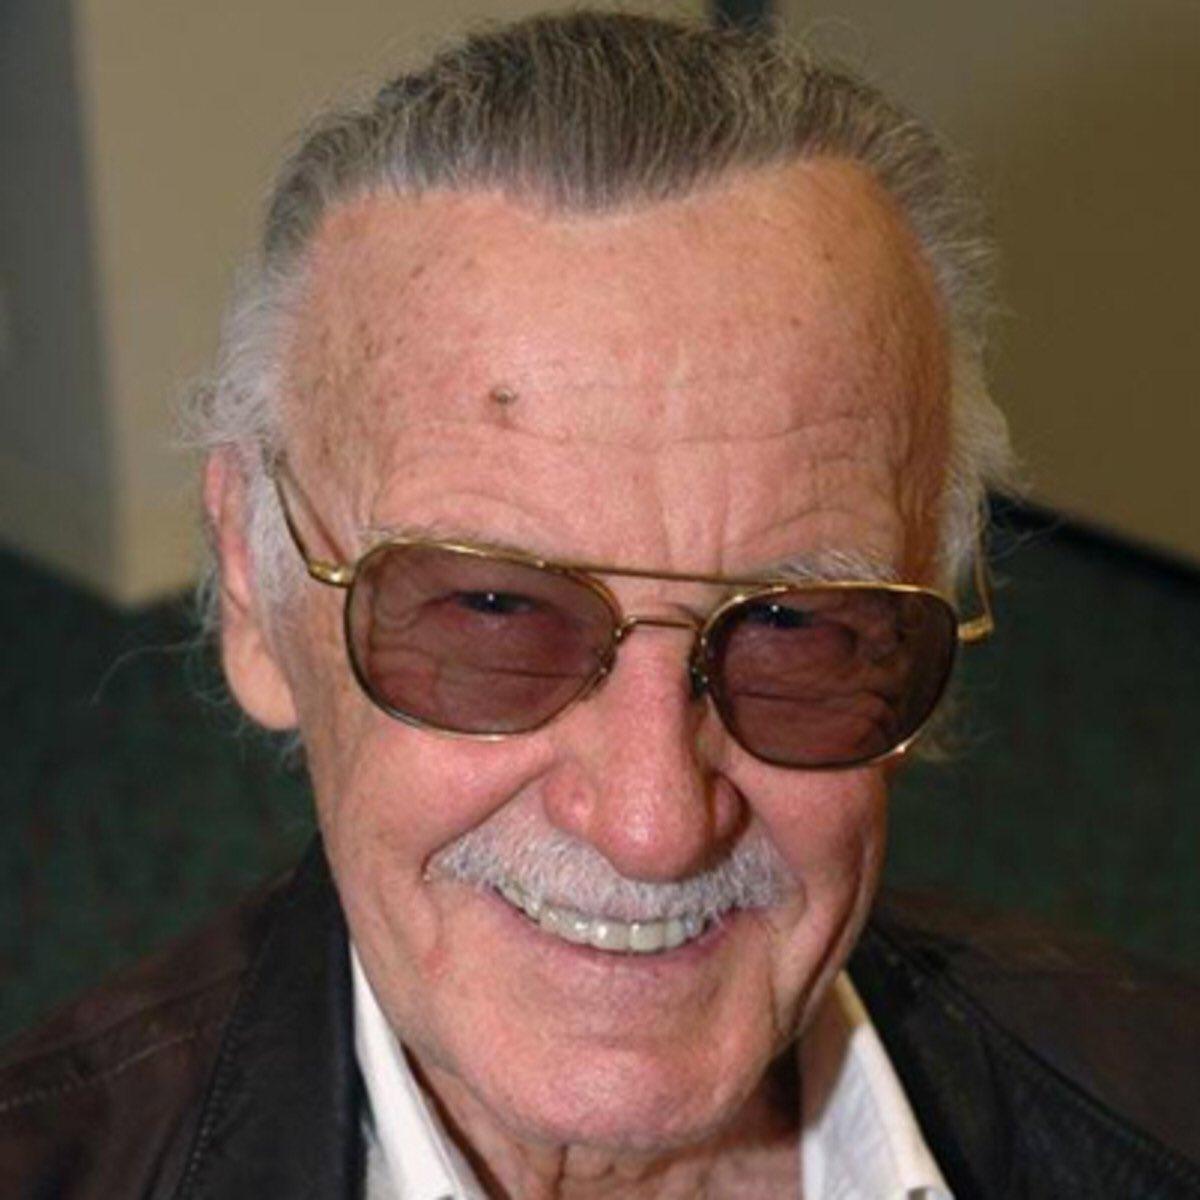 Jorge Sotomayor's photo on Stan Lee